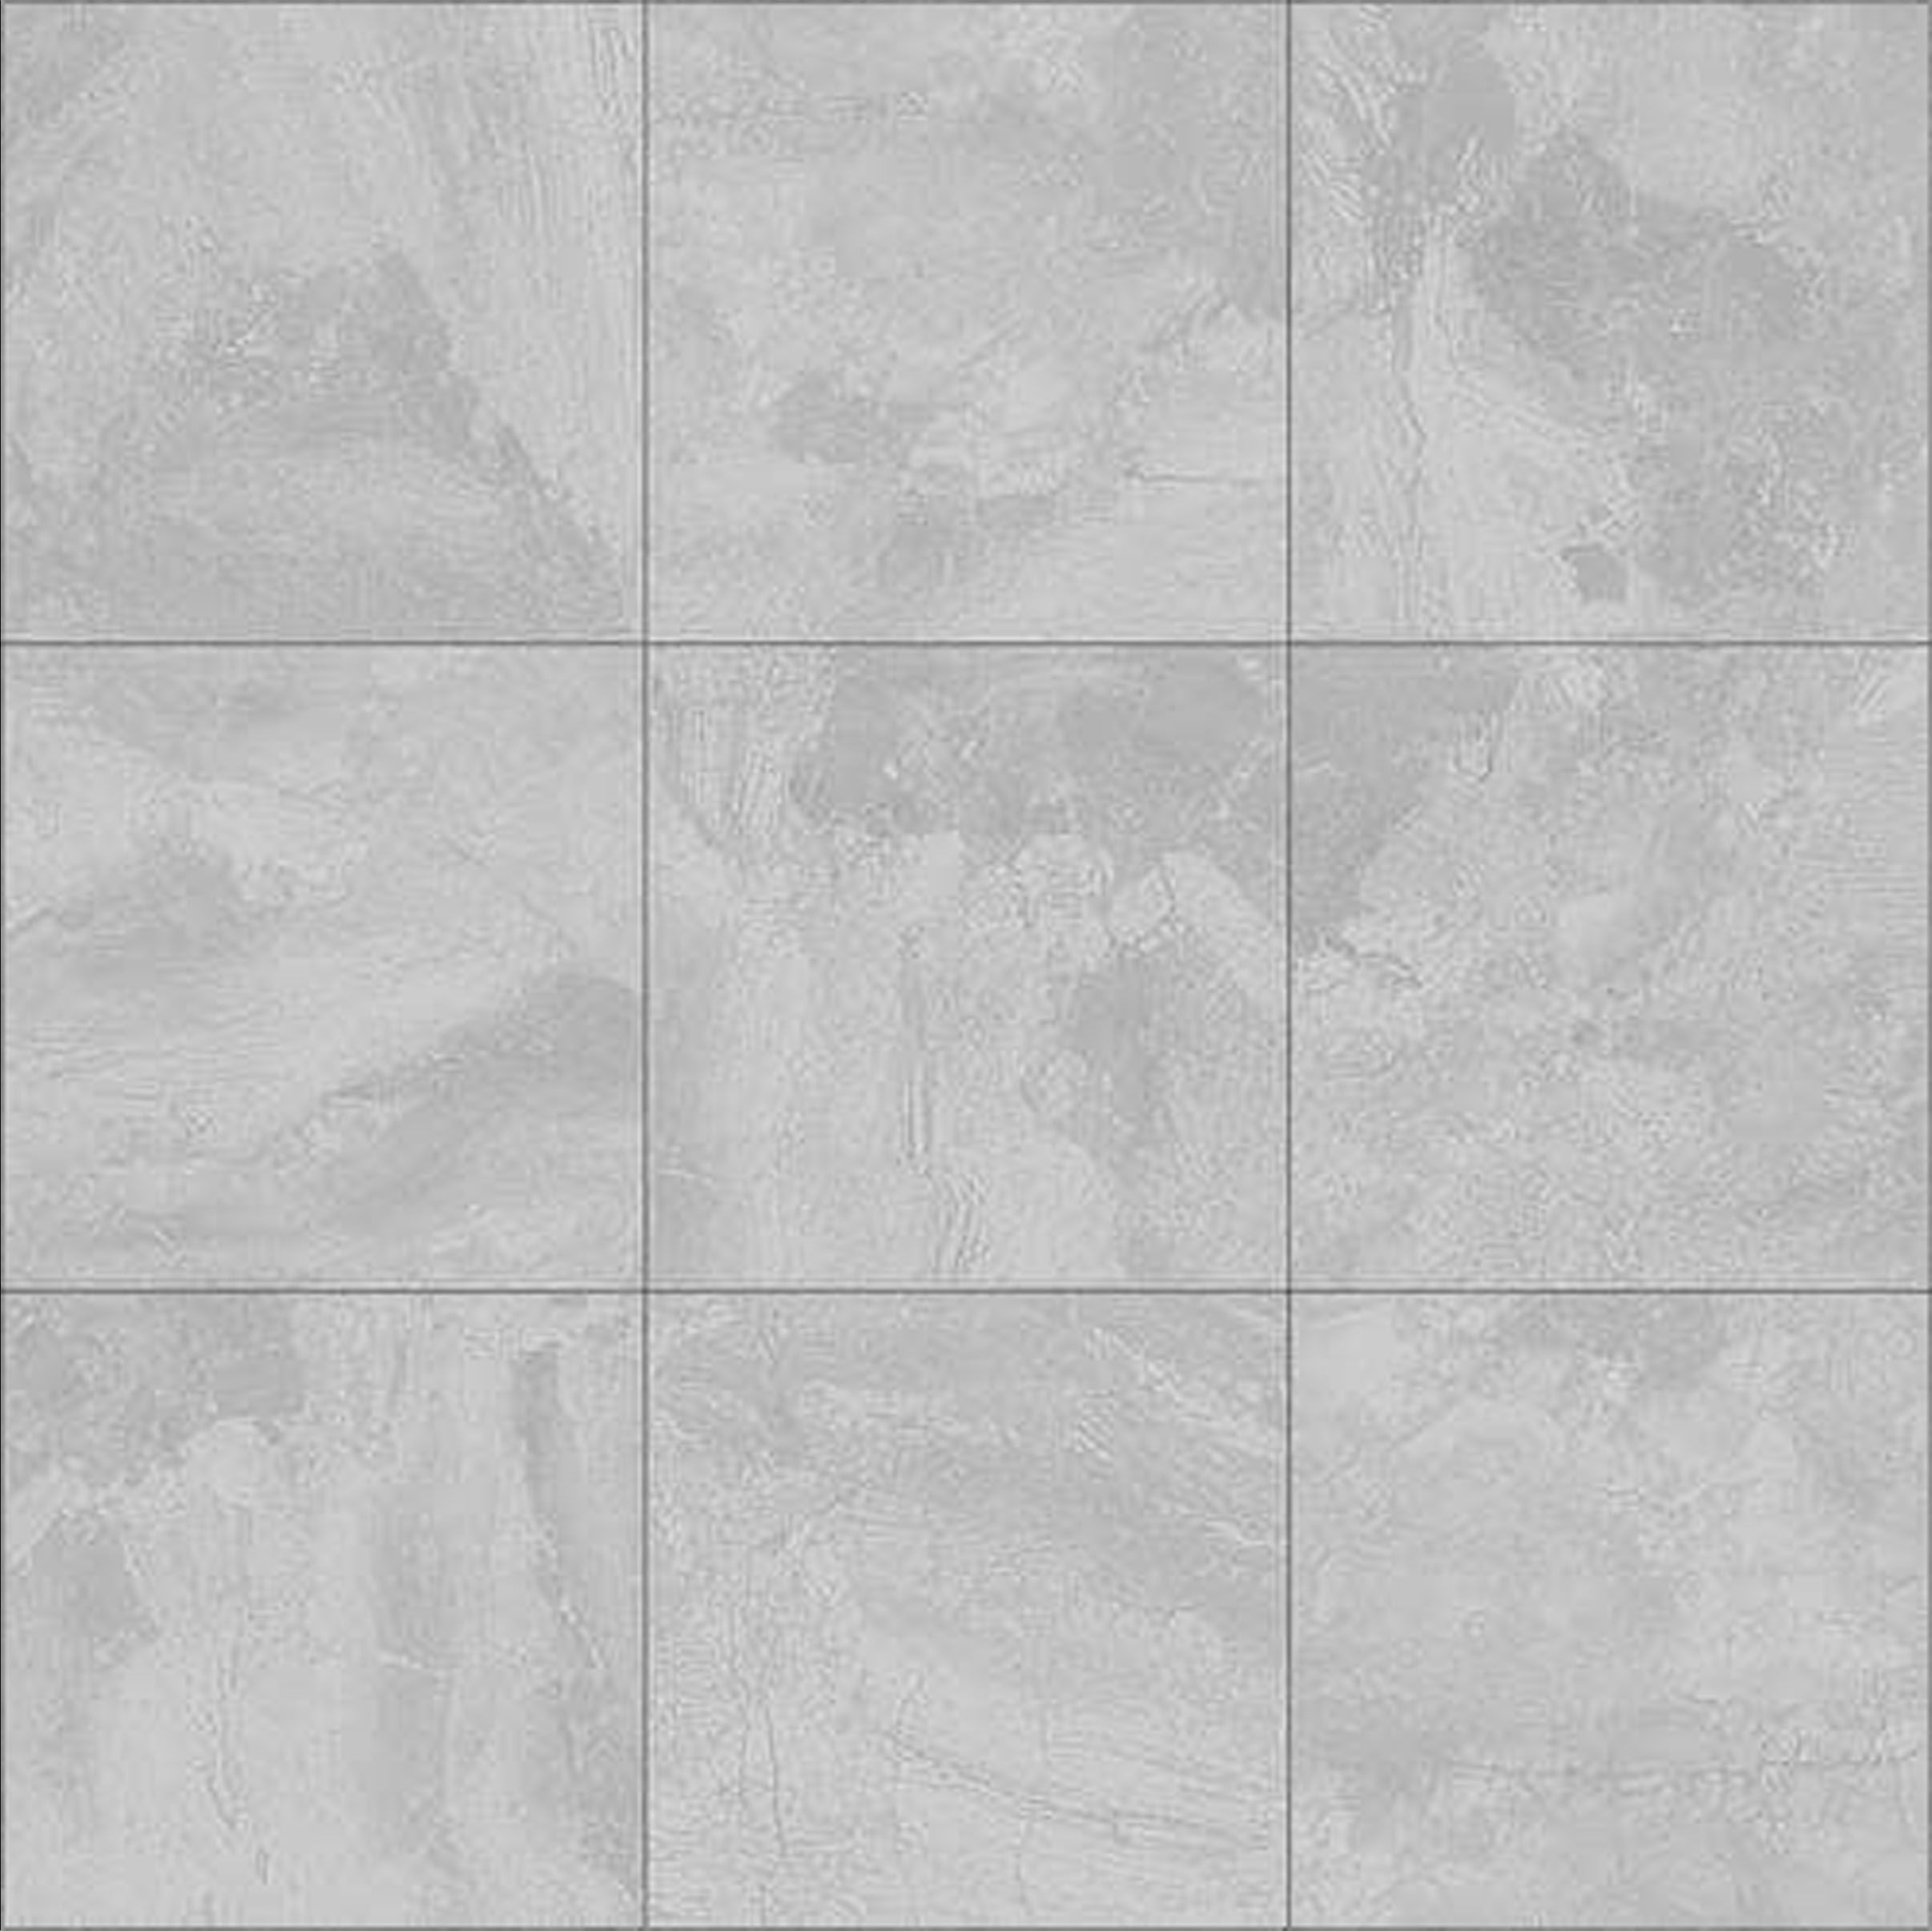 Pin De Skla Proyectos En Texturas